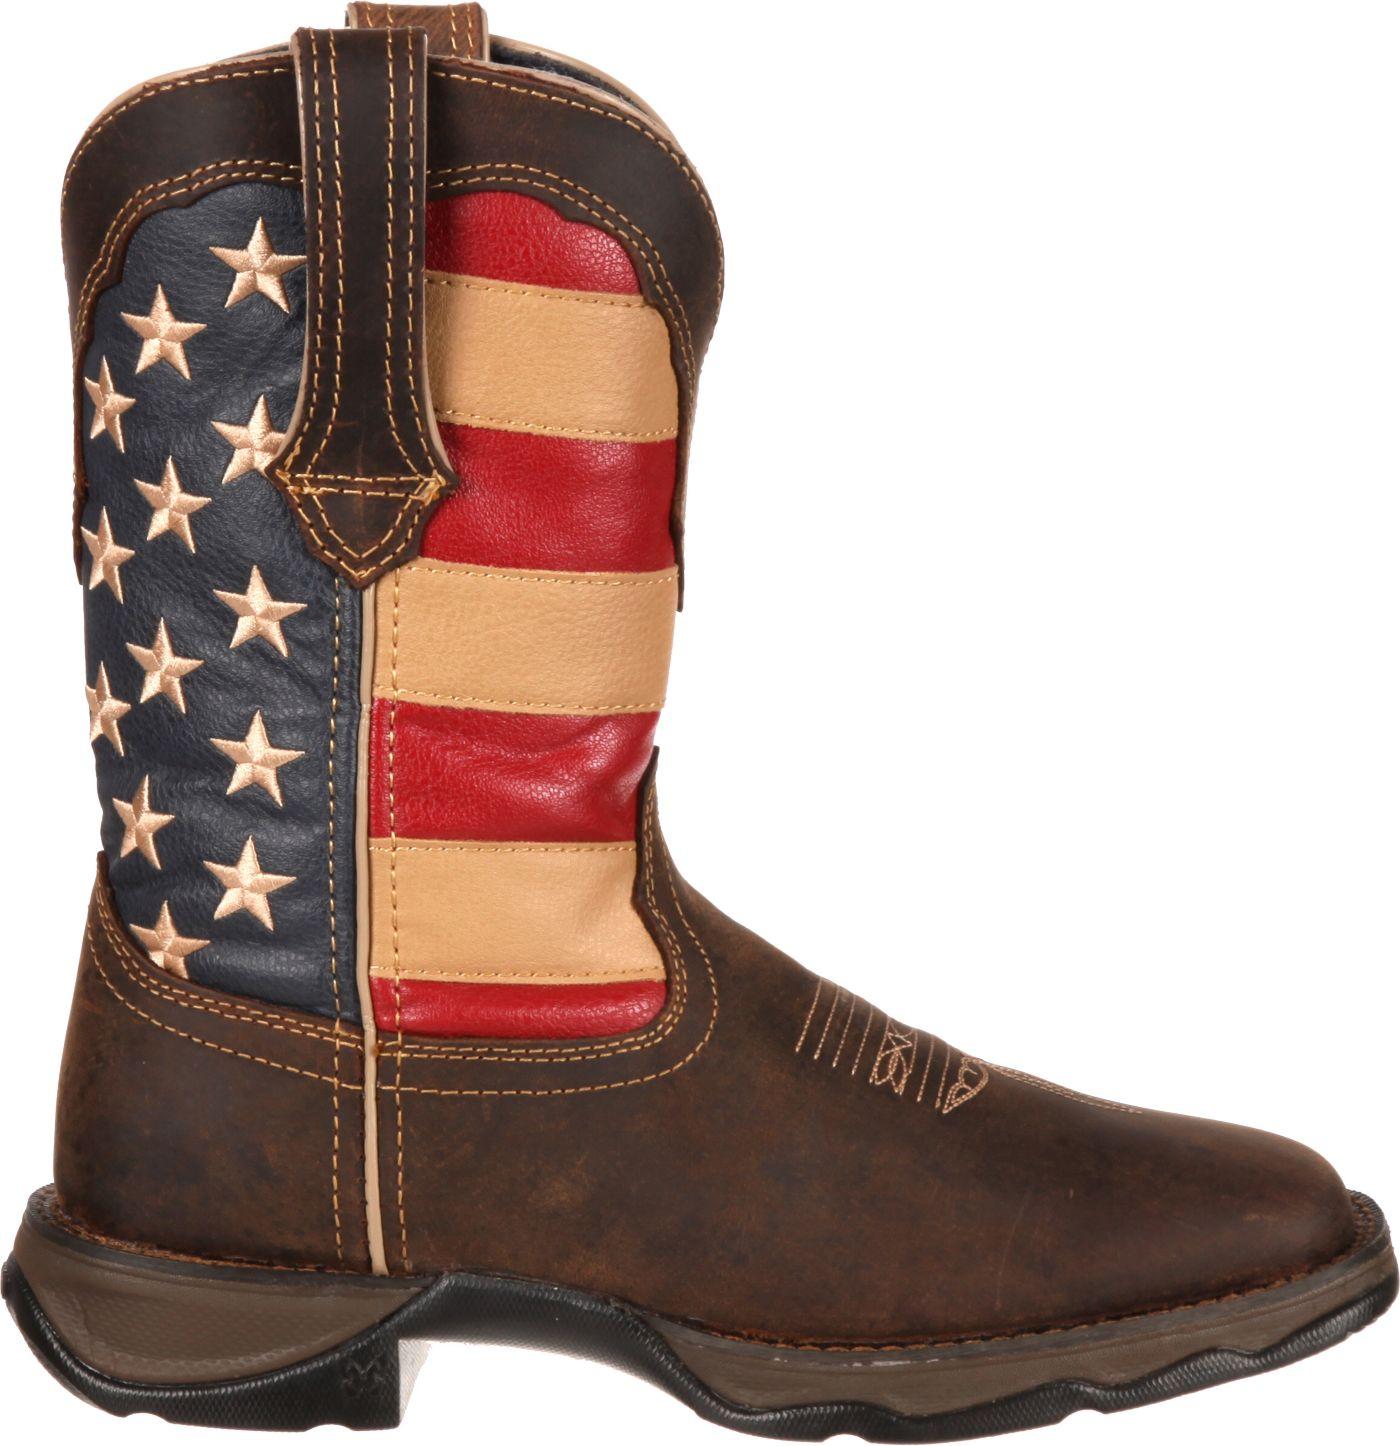 Durango Women's Lady Rebel Patriotic Pull-On Western Work Boots